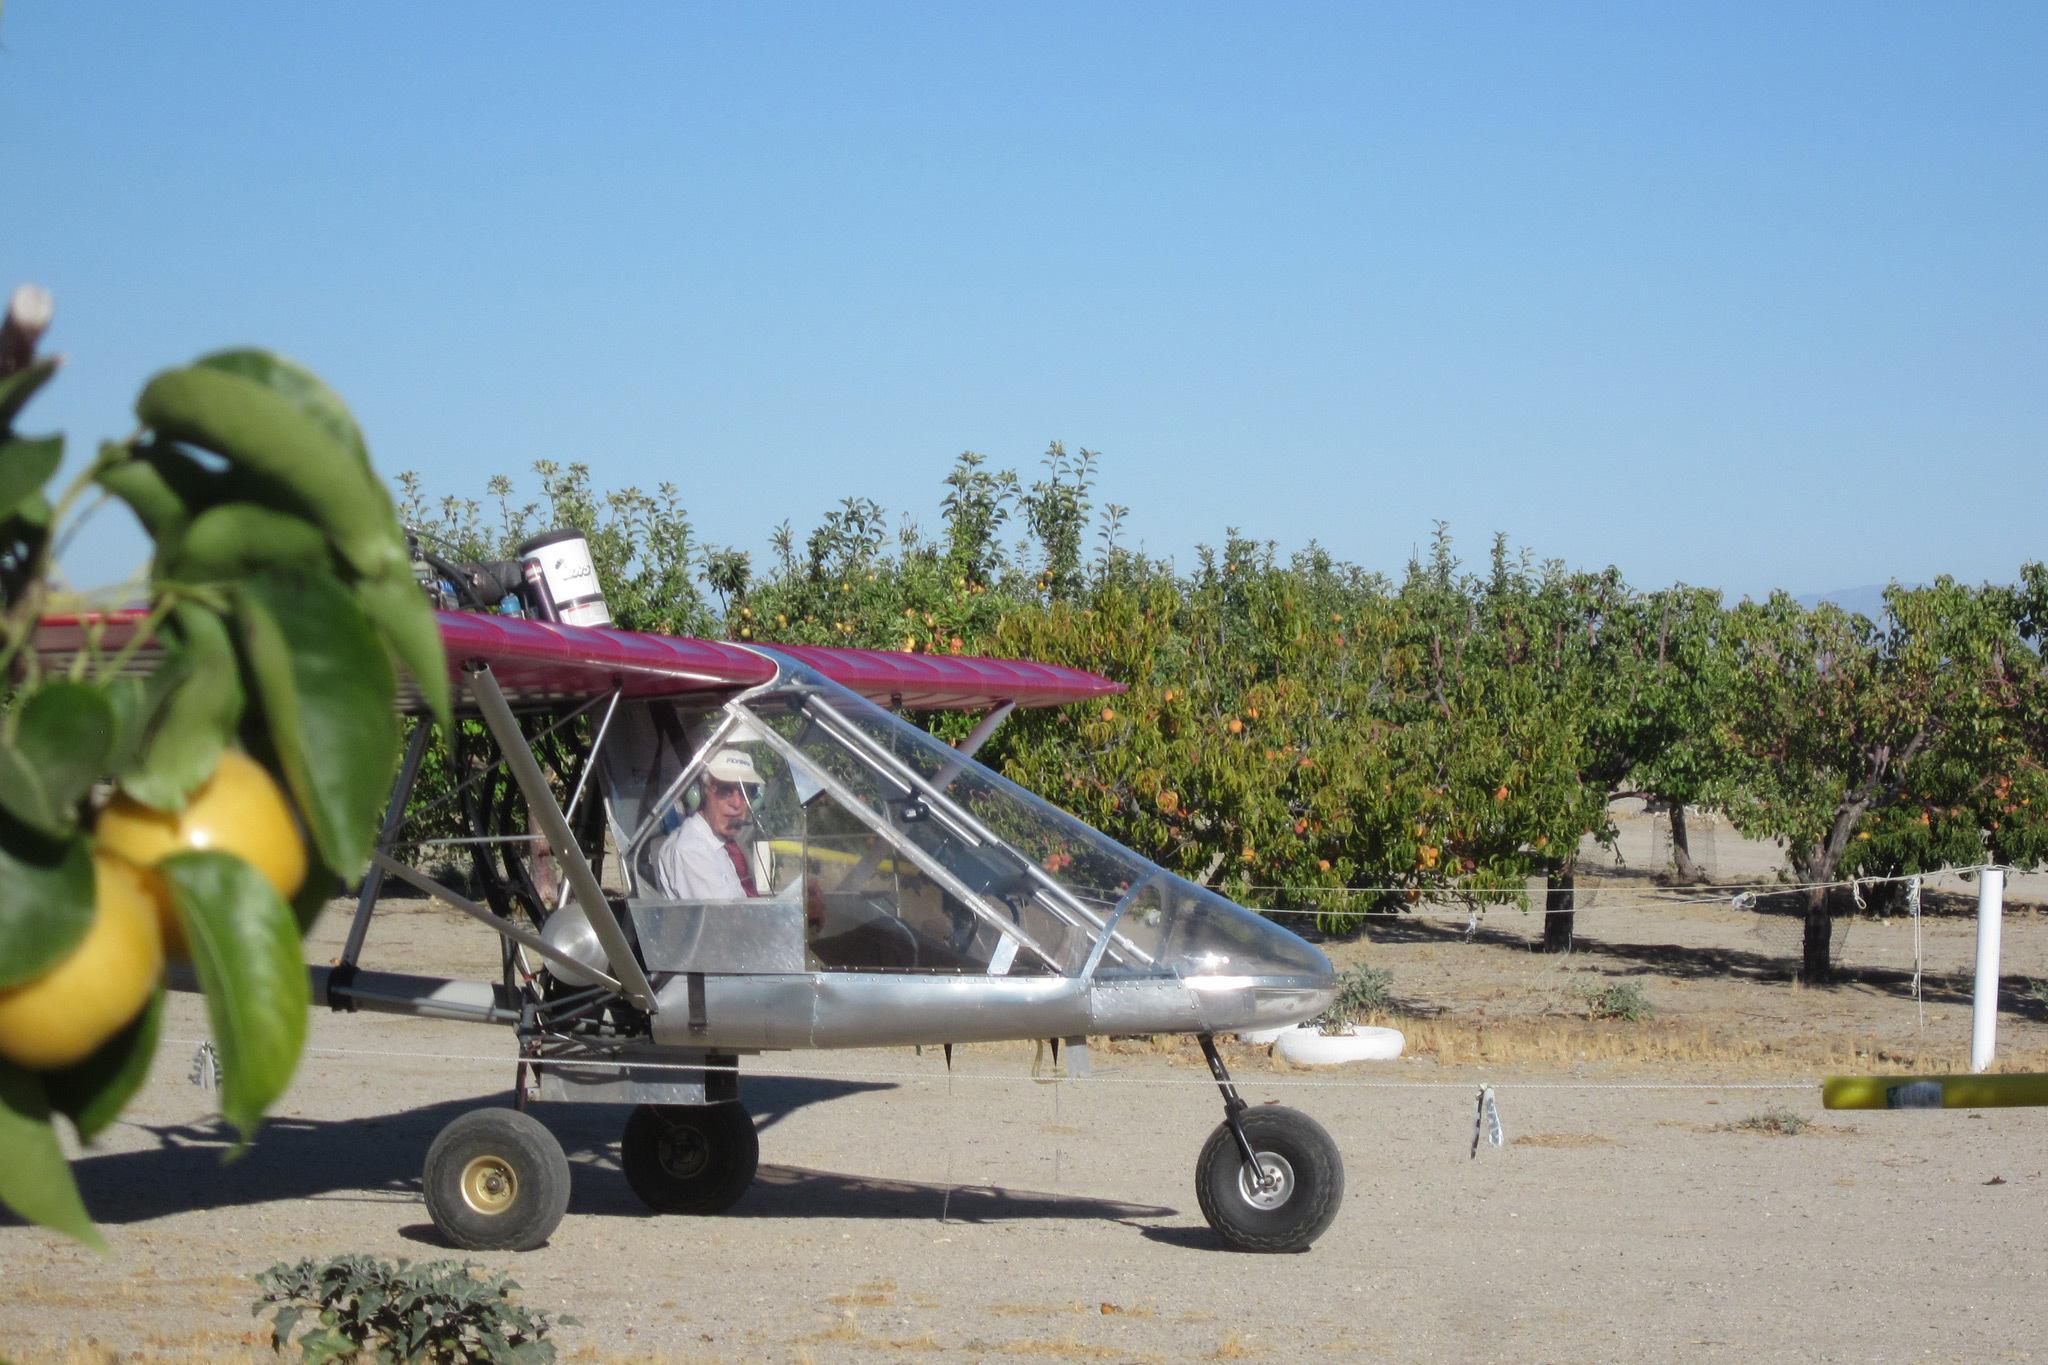 Brian Ranch Airport U-Pick Orchard